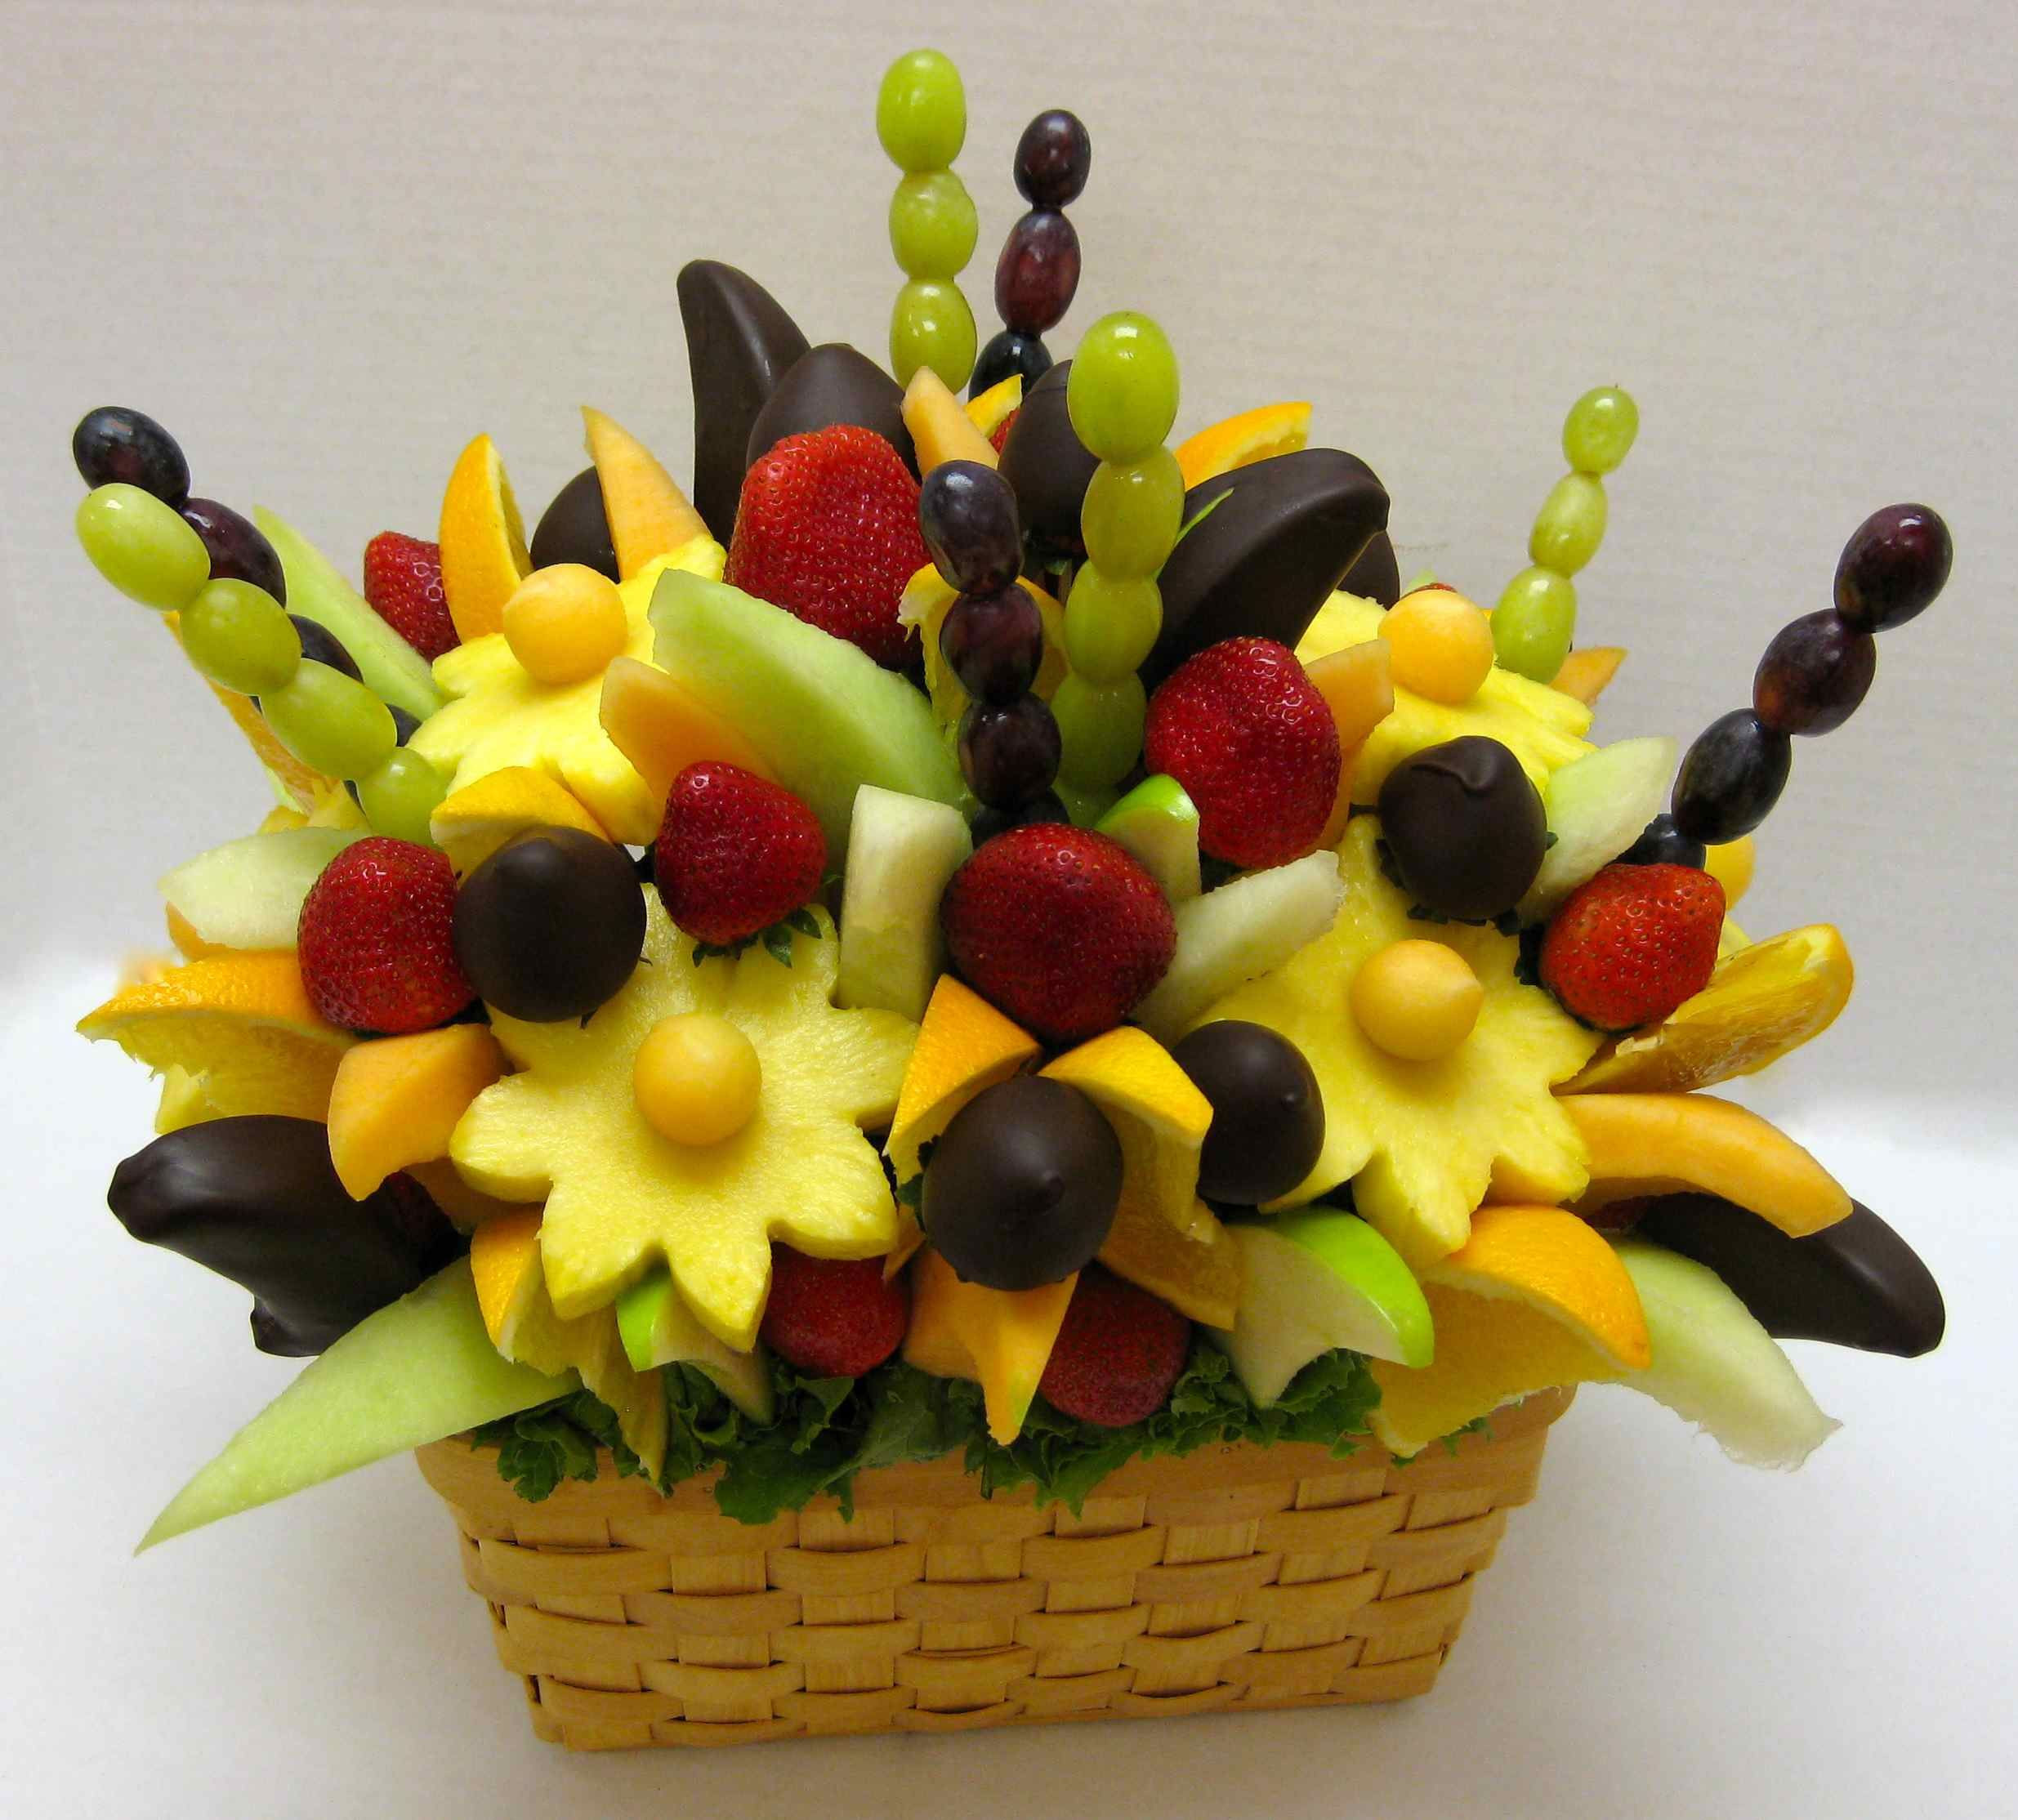 How to make a DO IT YOURSELF edible fruit arrangement crazeedaisee